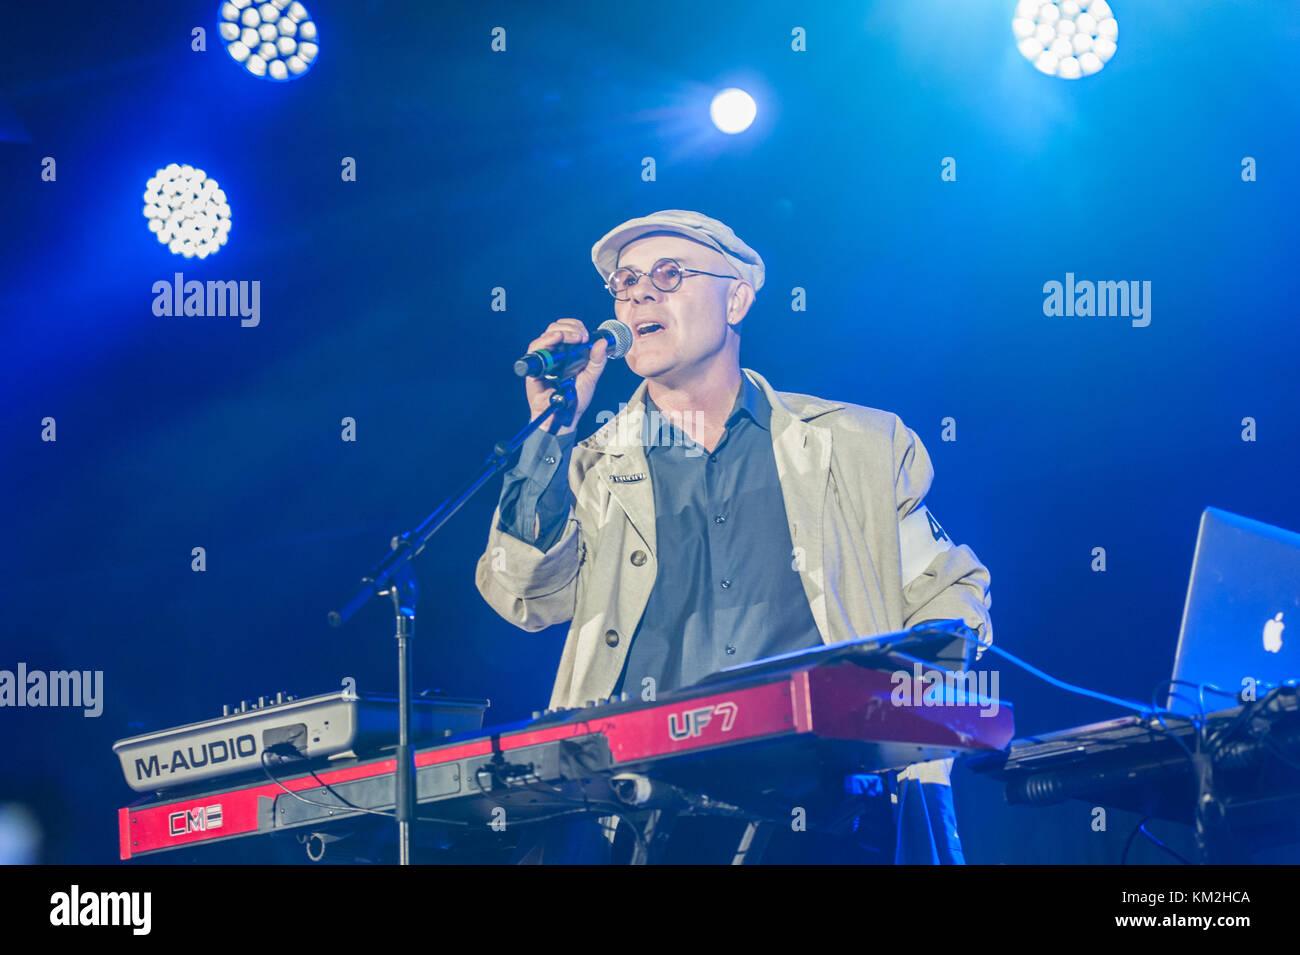 Bognor Regis, UK. 3rd Dec, 2017. Thomas Dolby closes Electric Dreams Festival. Credit: Ken Harrison/Alamy Live News - Stock Image